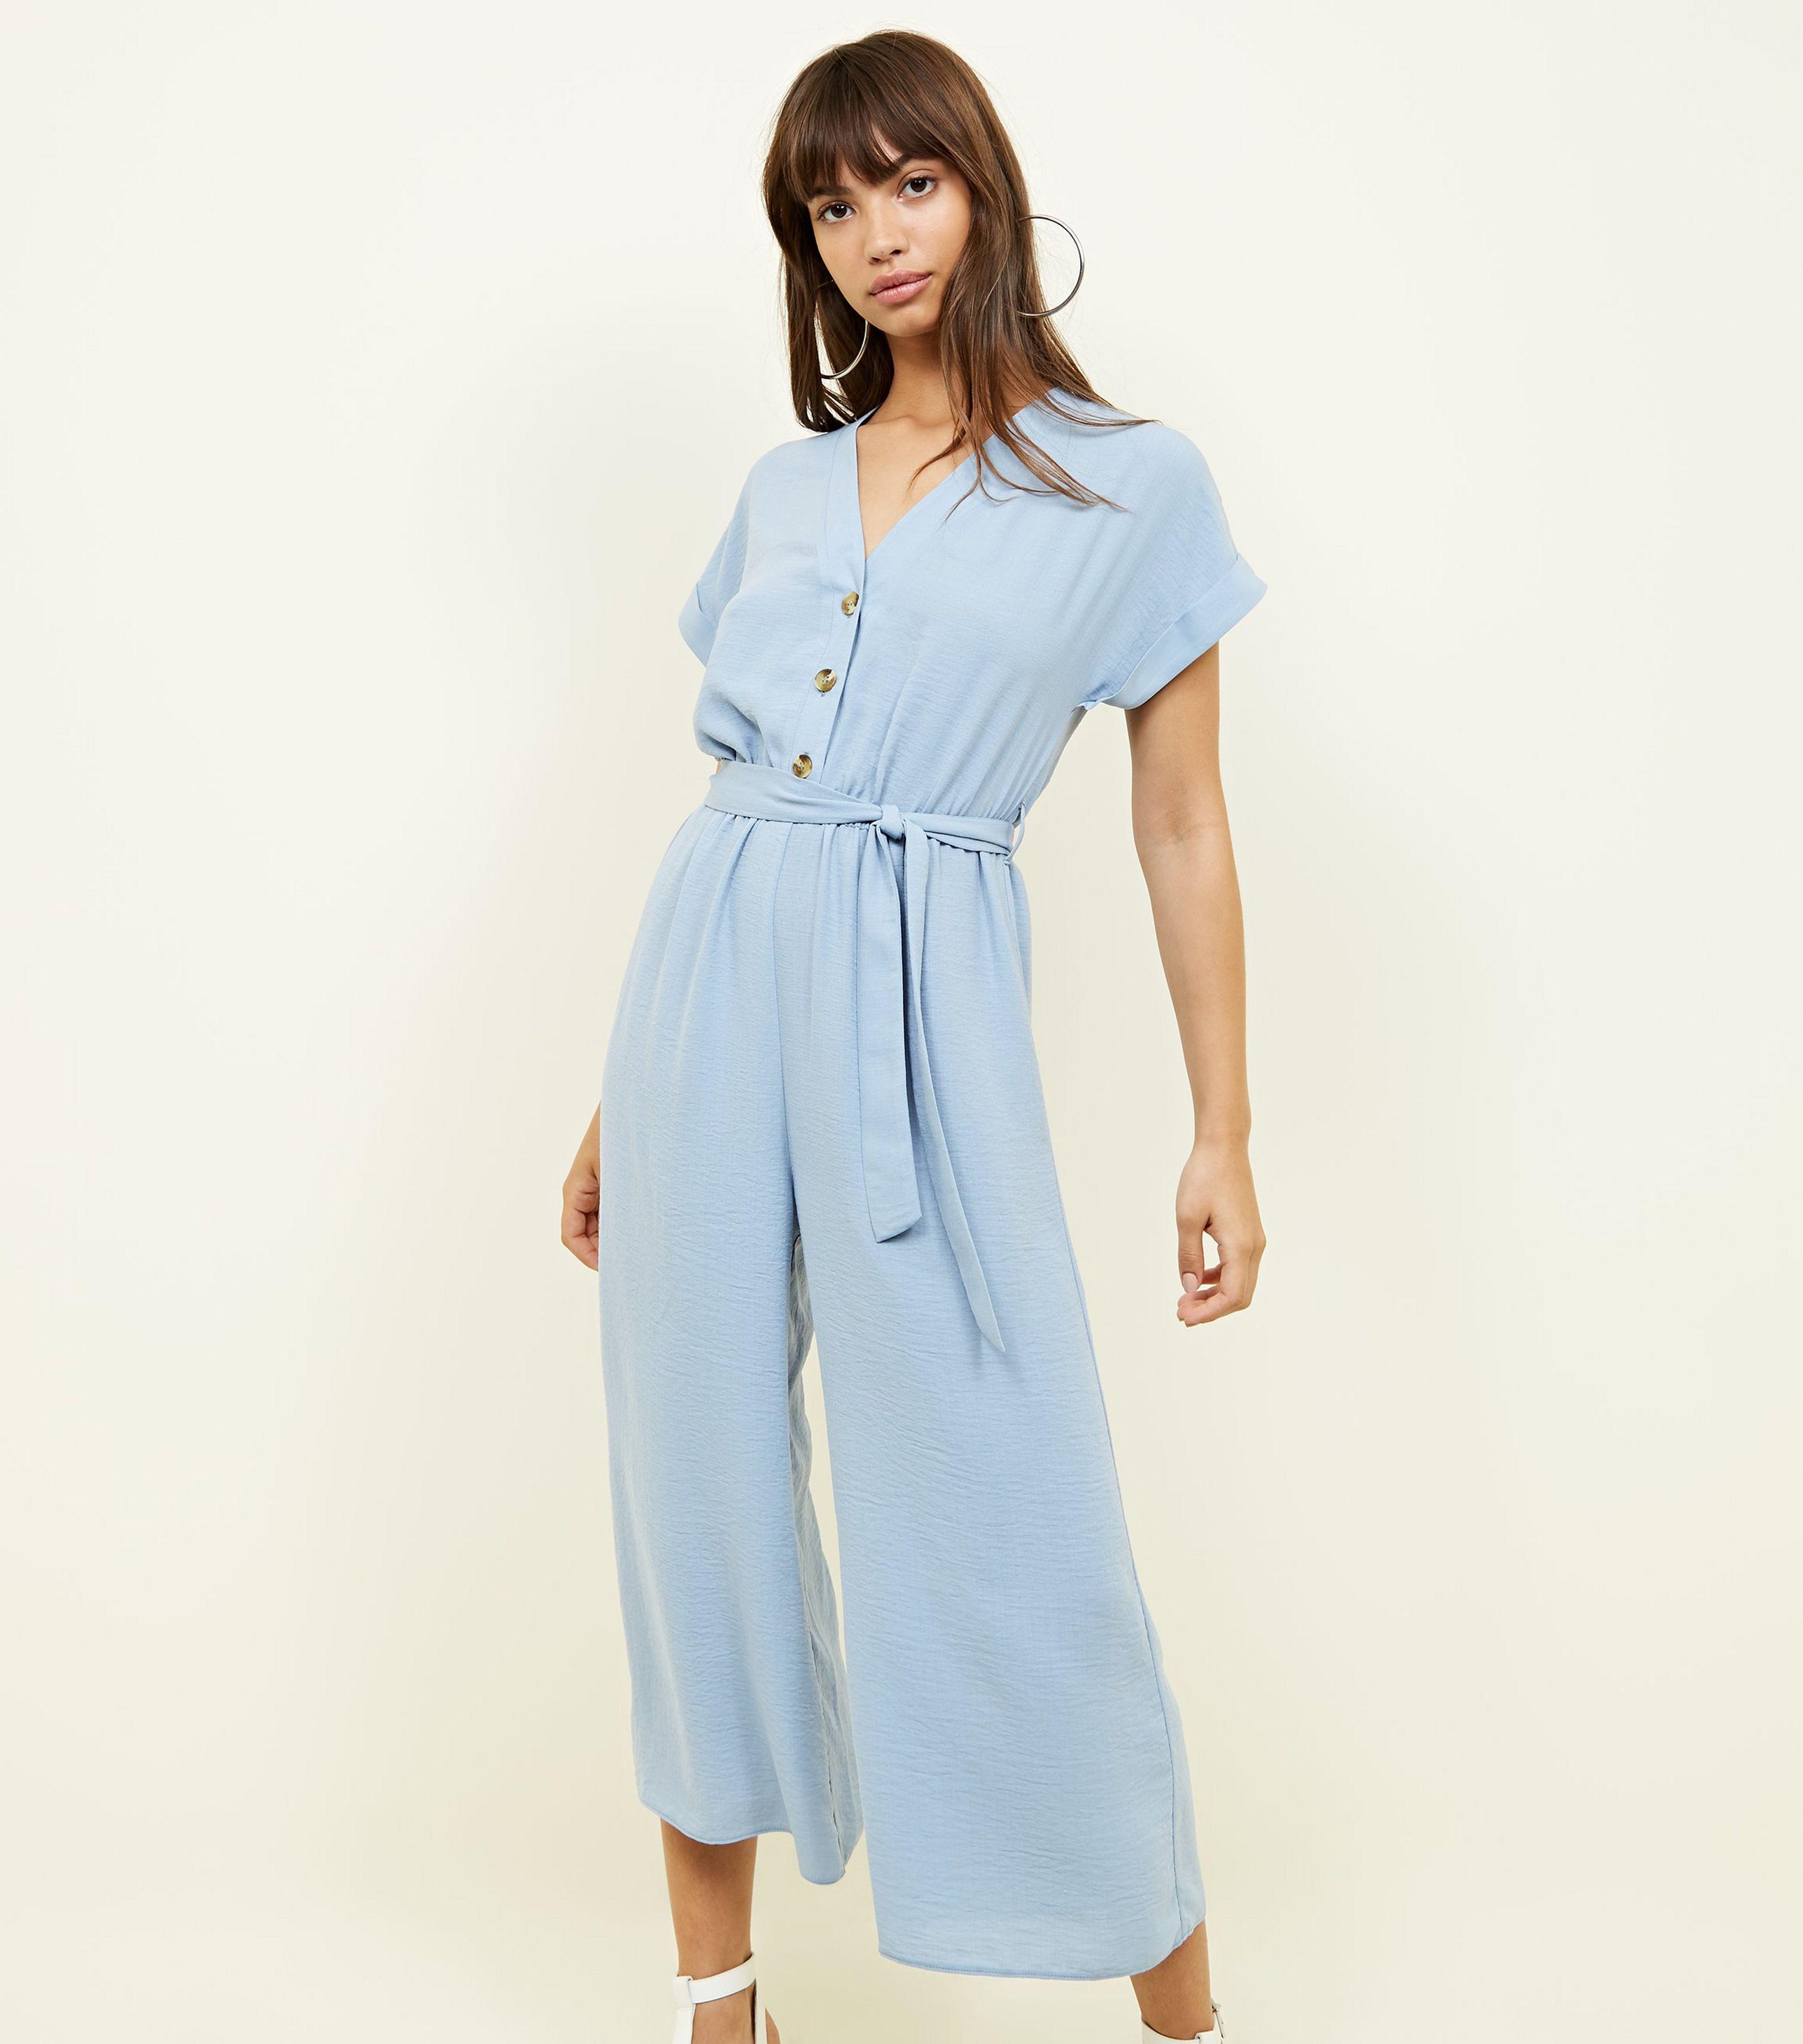 eaabb14650 New Look Blue Linen-look Button Up Culotte Jumpsuit in Blue - Lyst